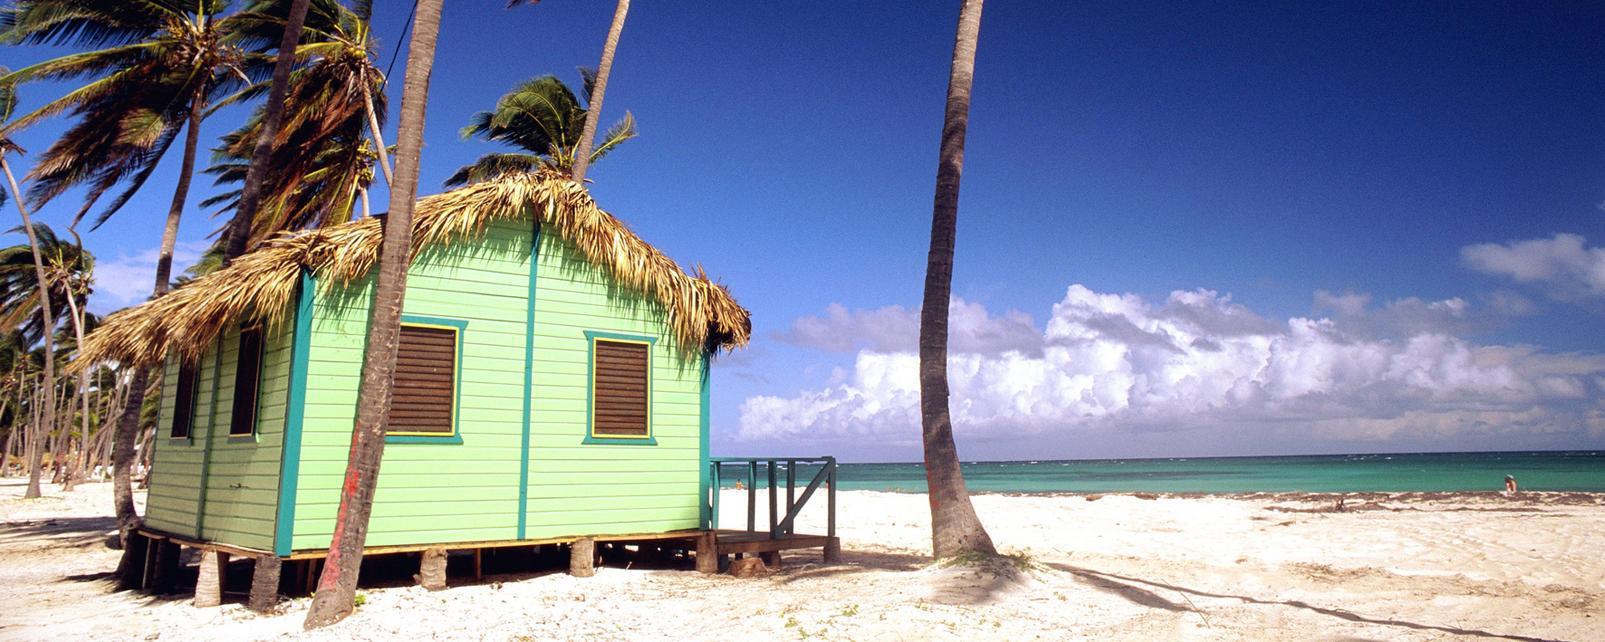 Caraïbes; Caraibes; République dominicaine; Punta Cana